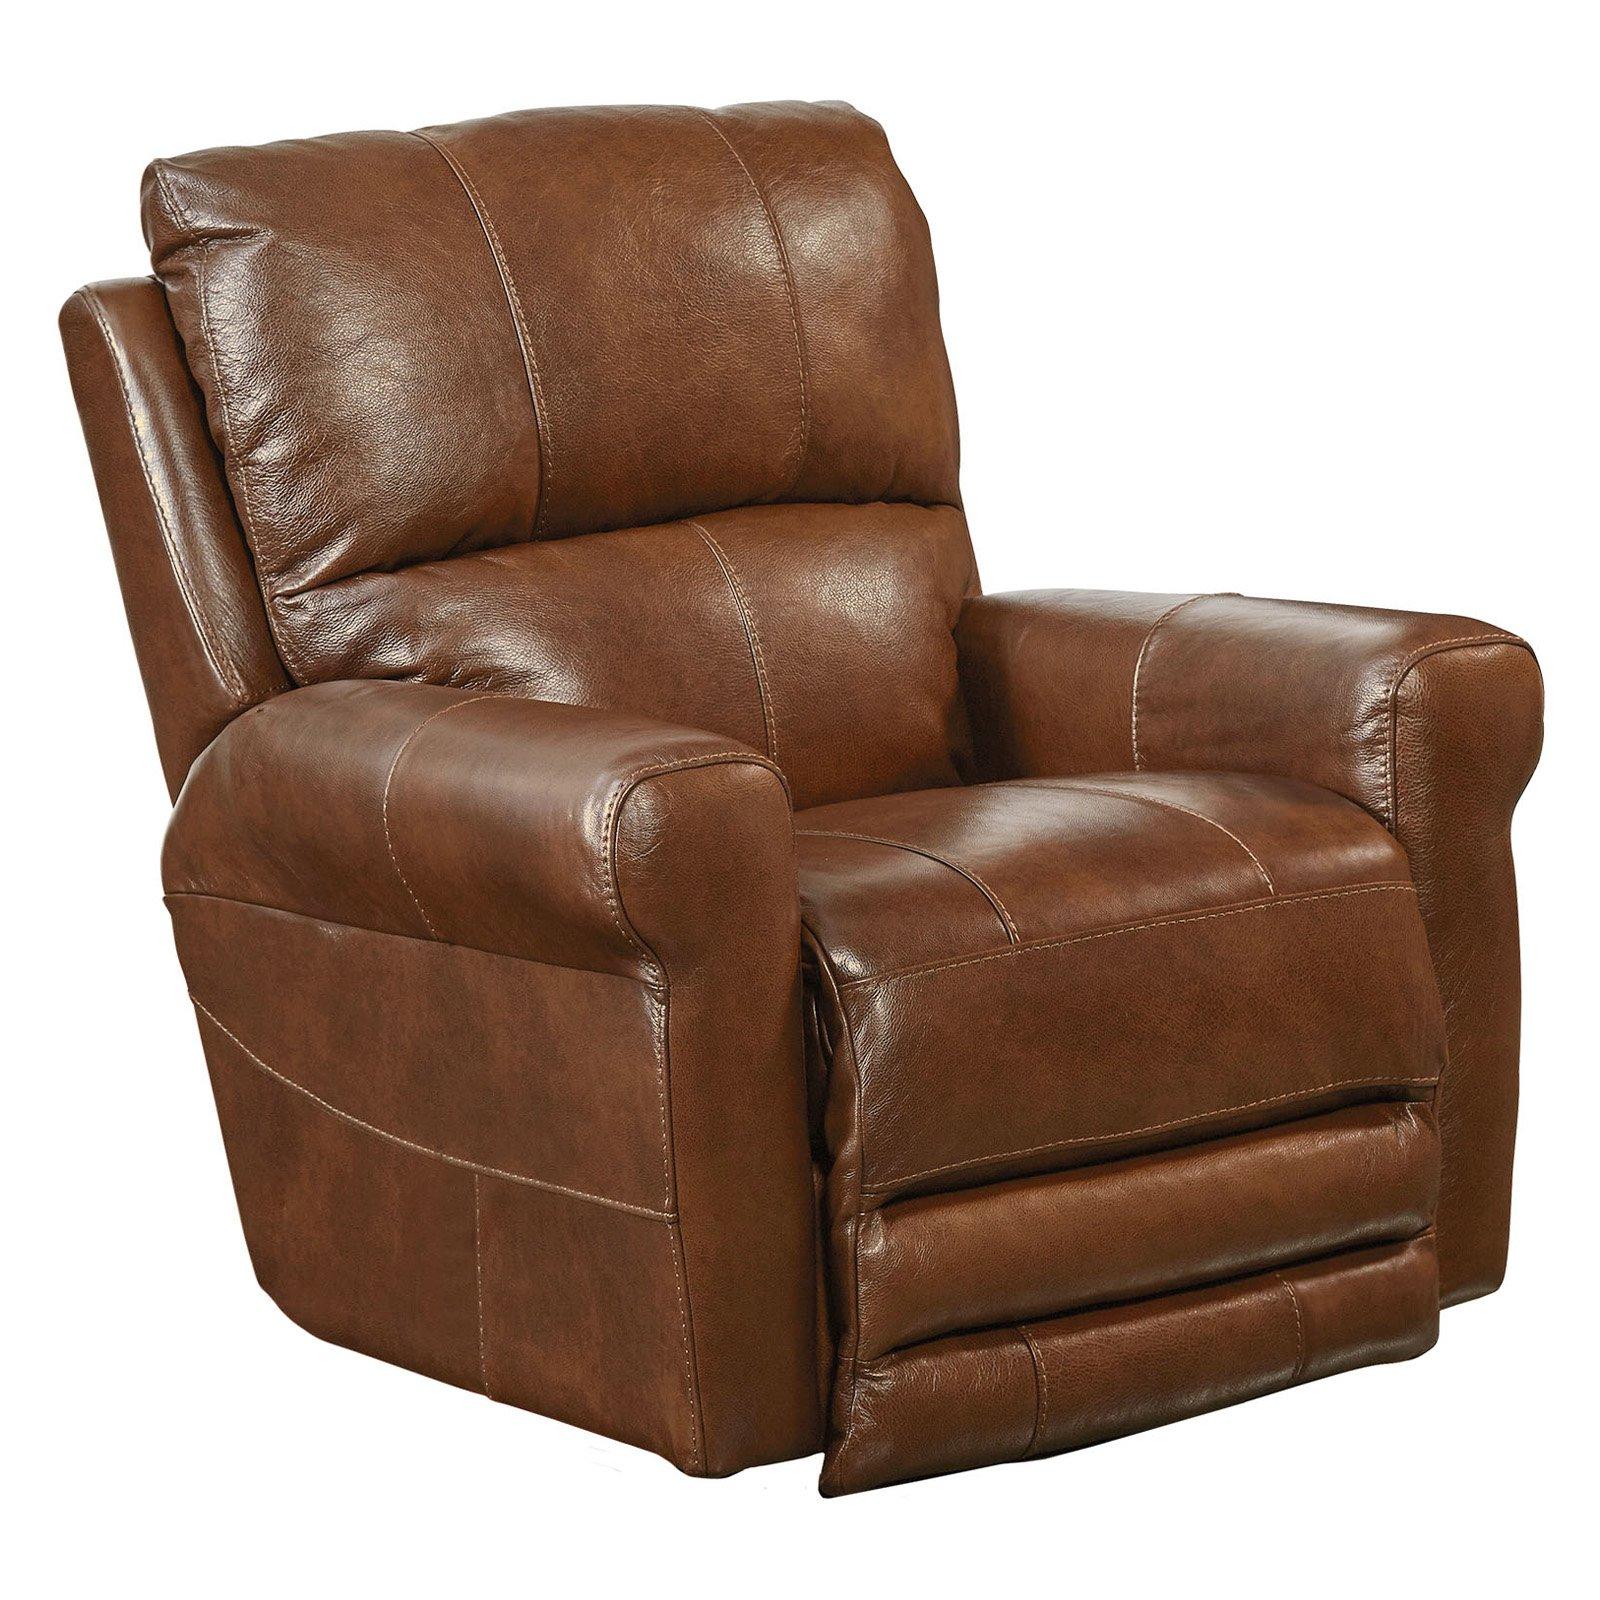 Pleasant Catnapper Hoffner Leather Power Lay Flat Recliner Chestnut Dailytribune Chair Design For Home Dailytribuneorg